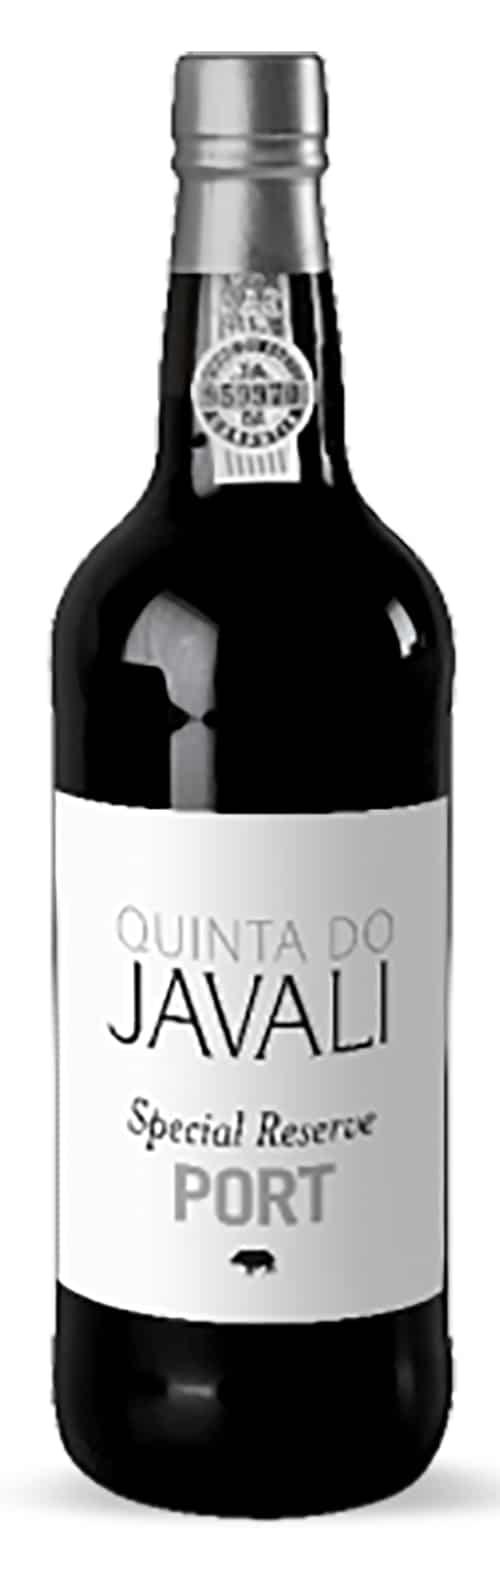 Quinta do Javali Special Reserve Port